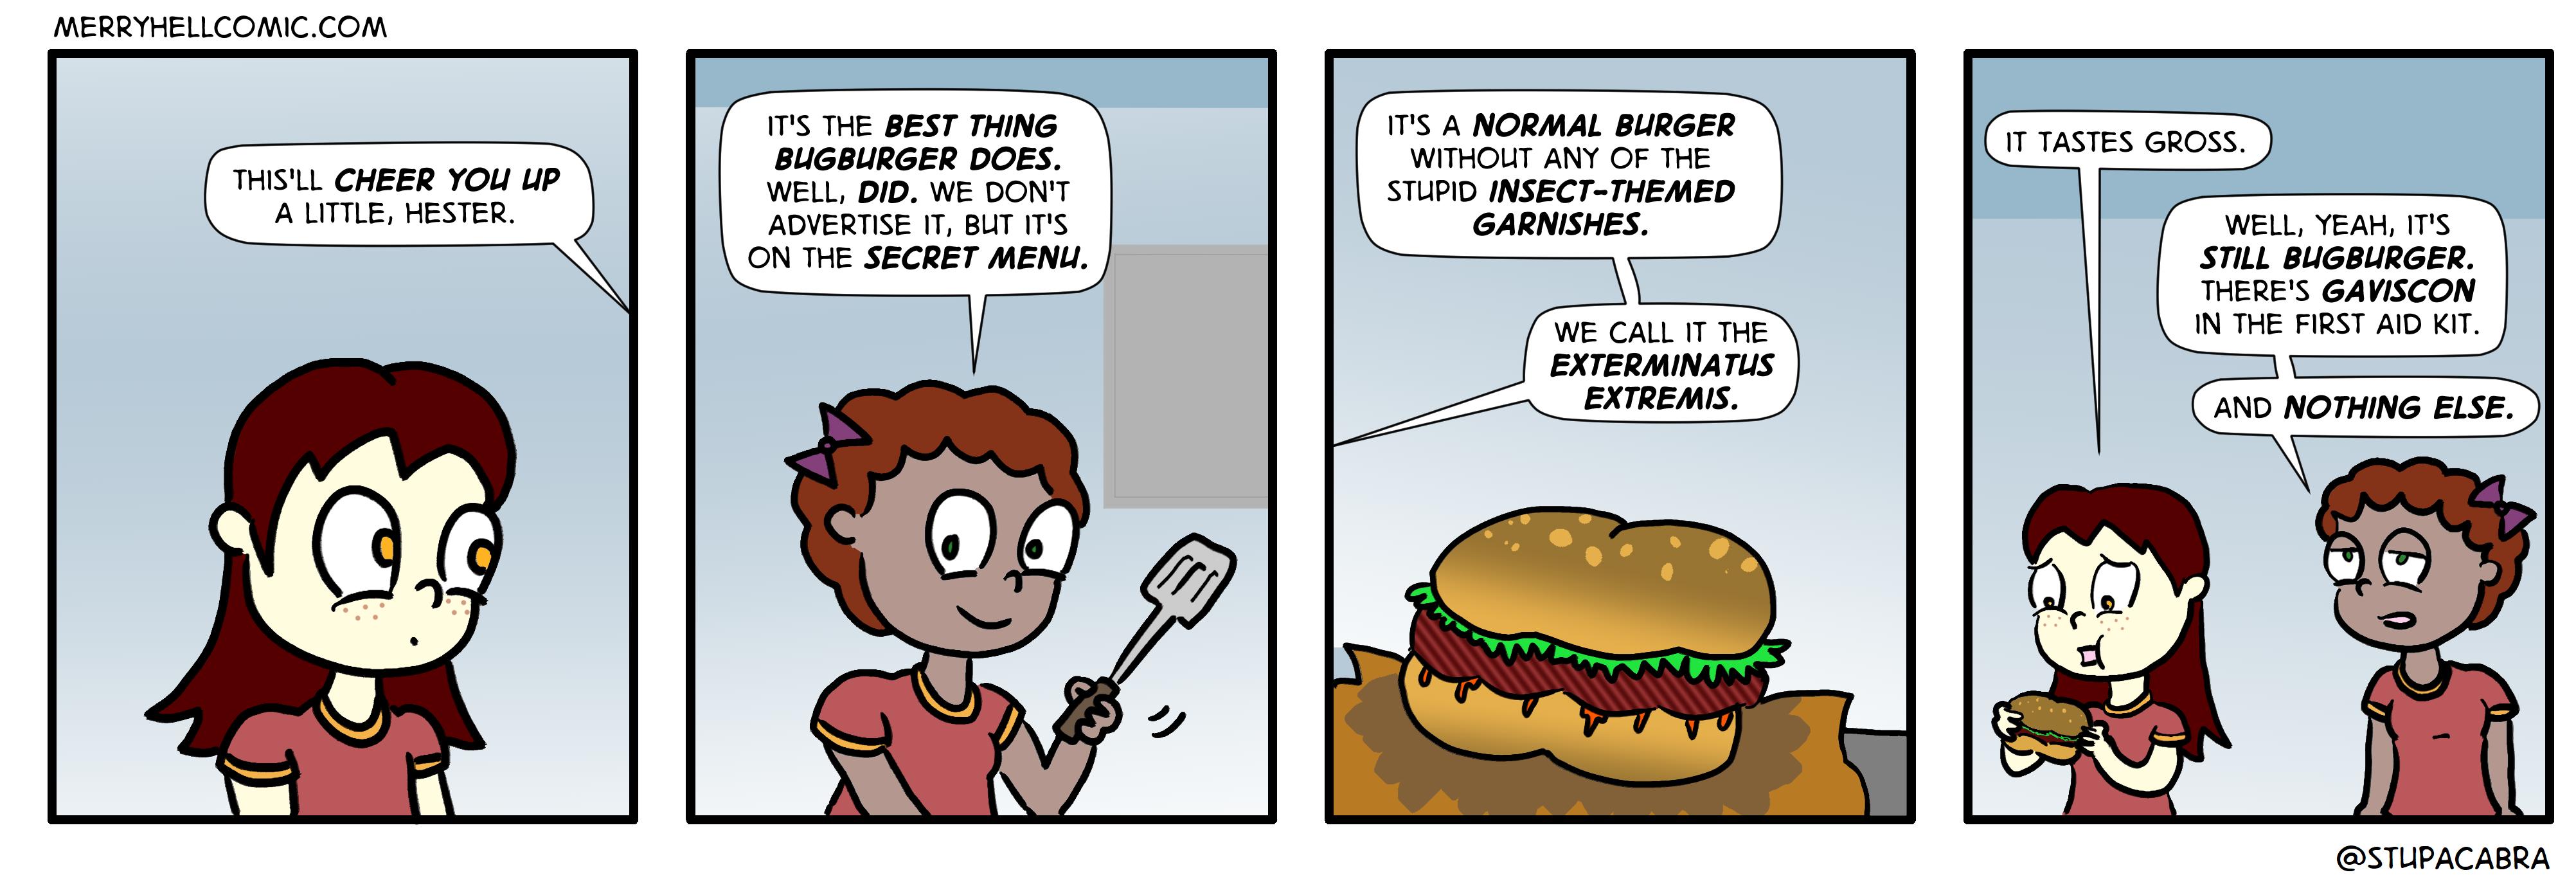 249. Secret menu